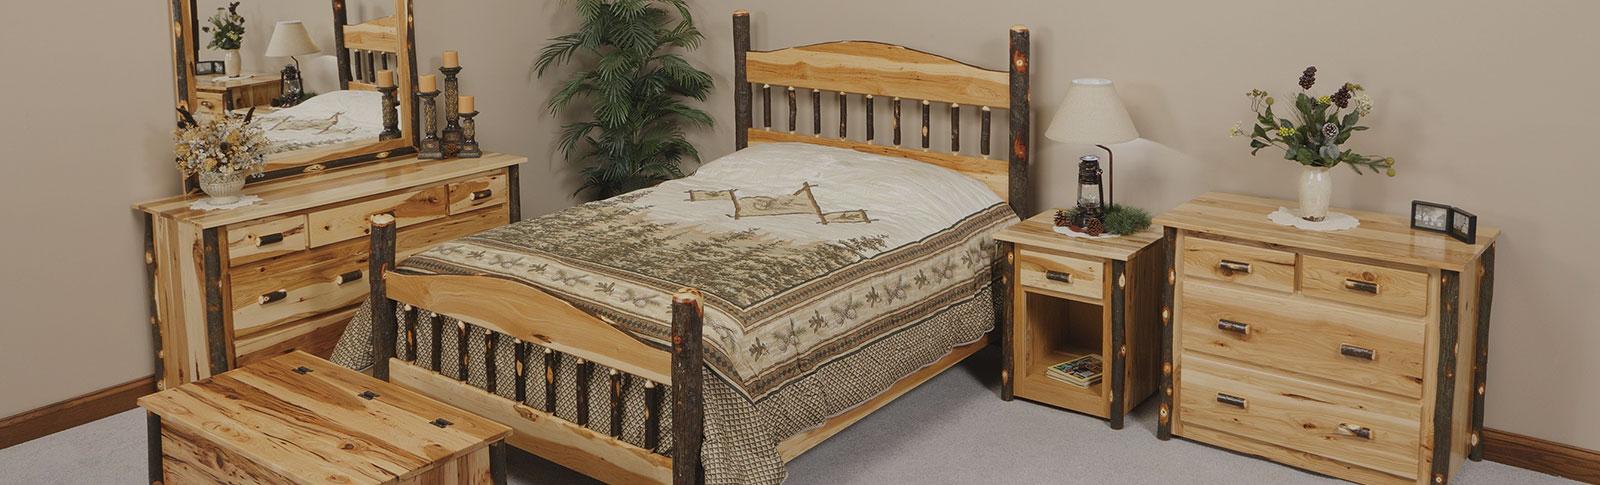 Quality Furniture Store | Bedroom Sets | Dining Room Sets ...